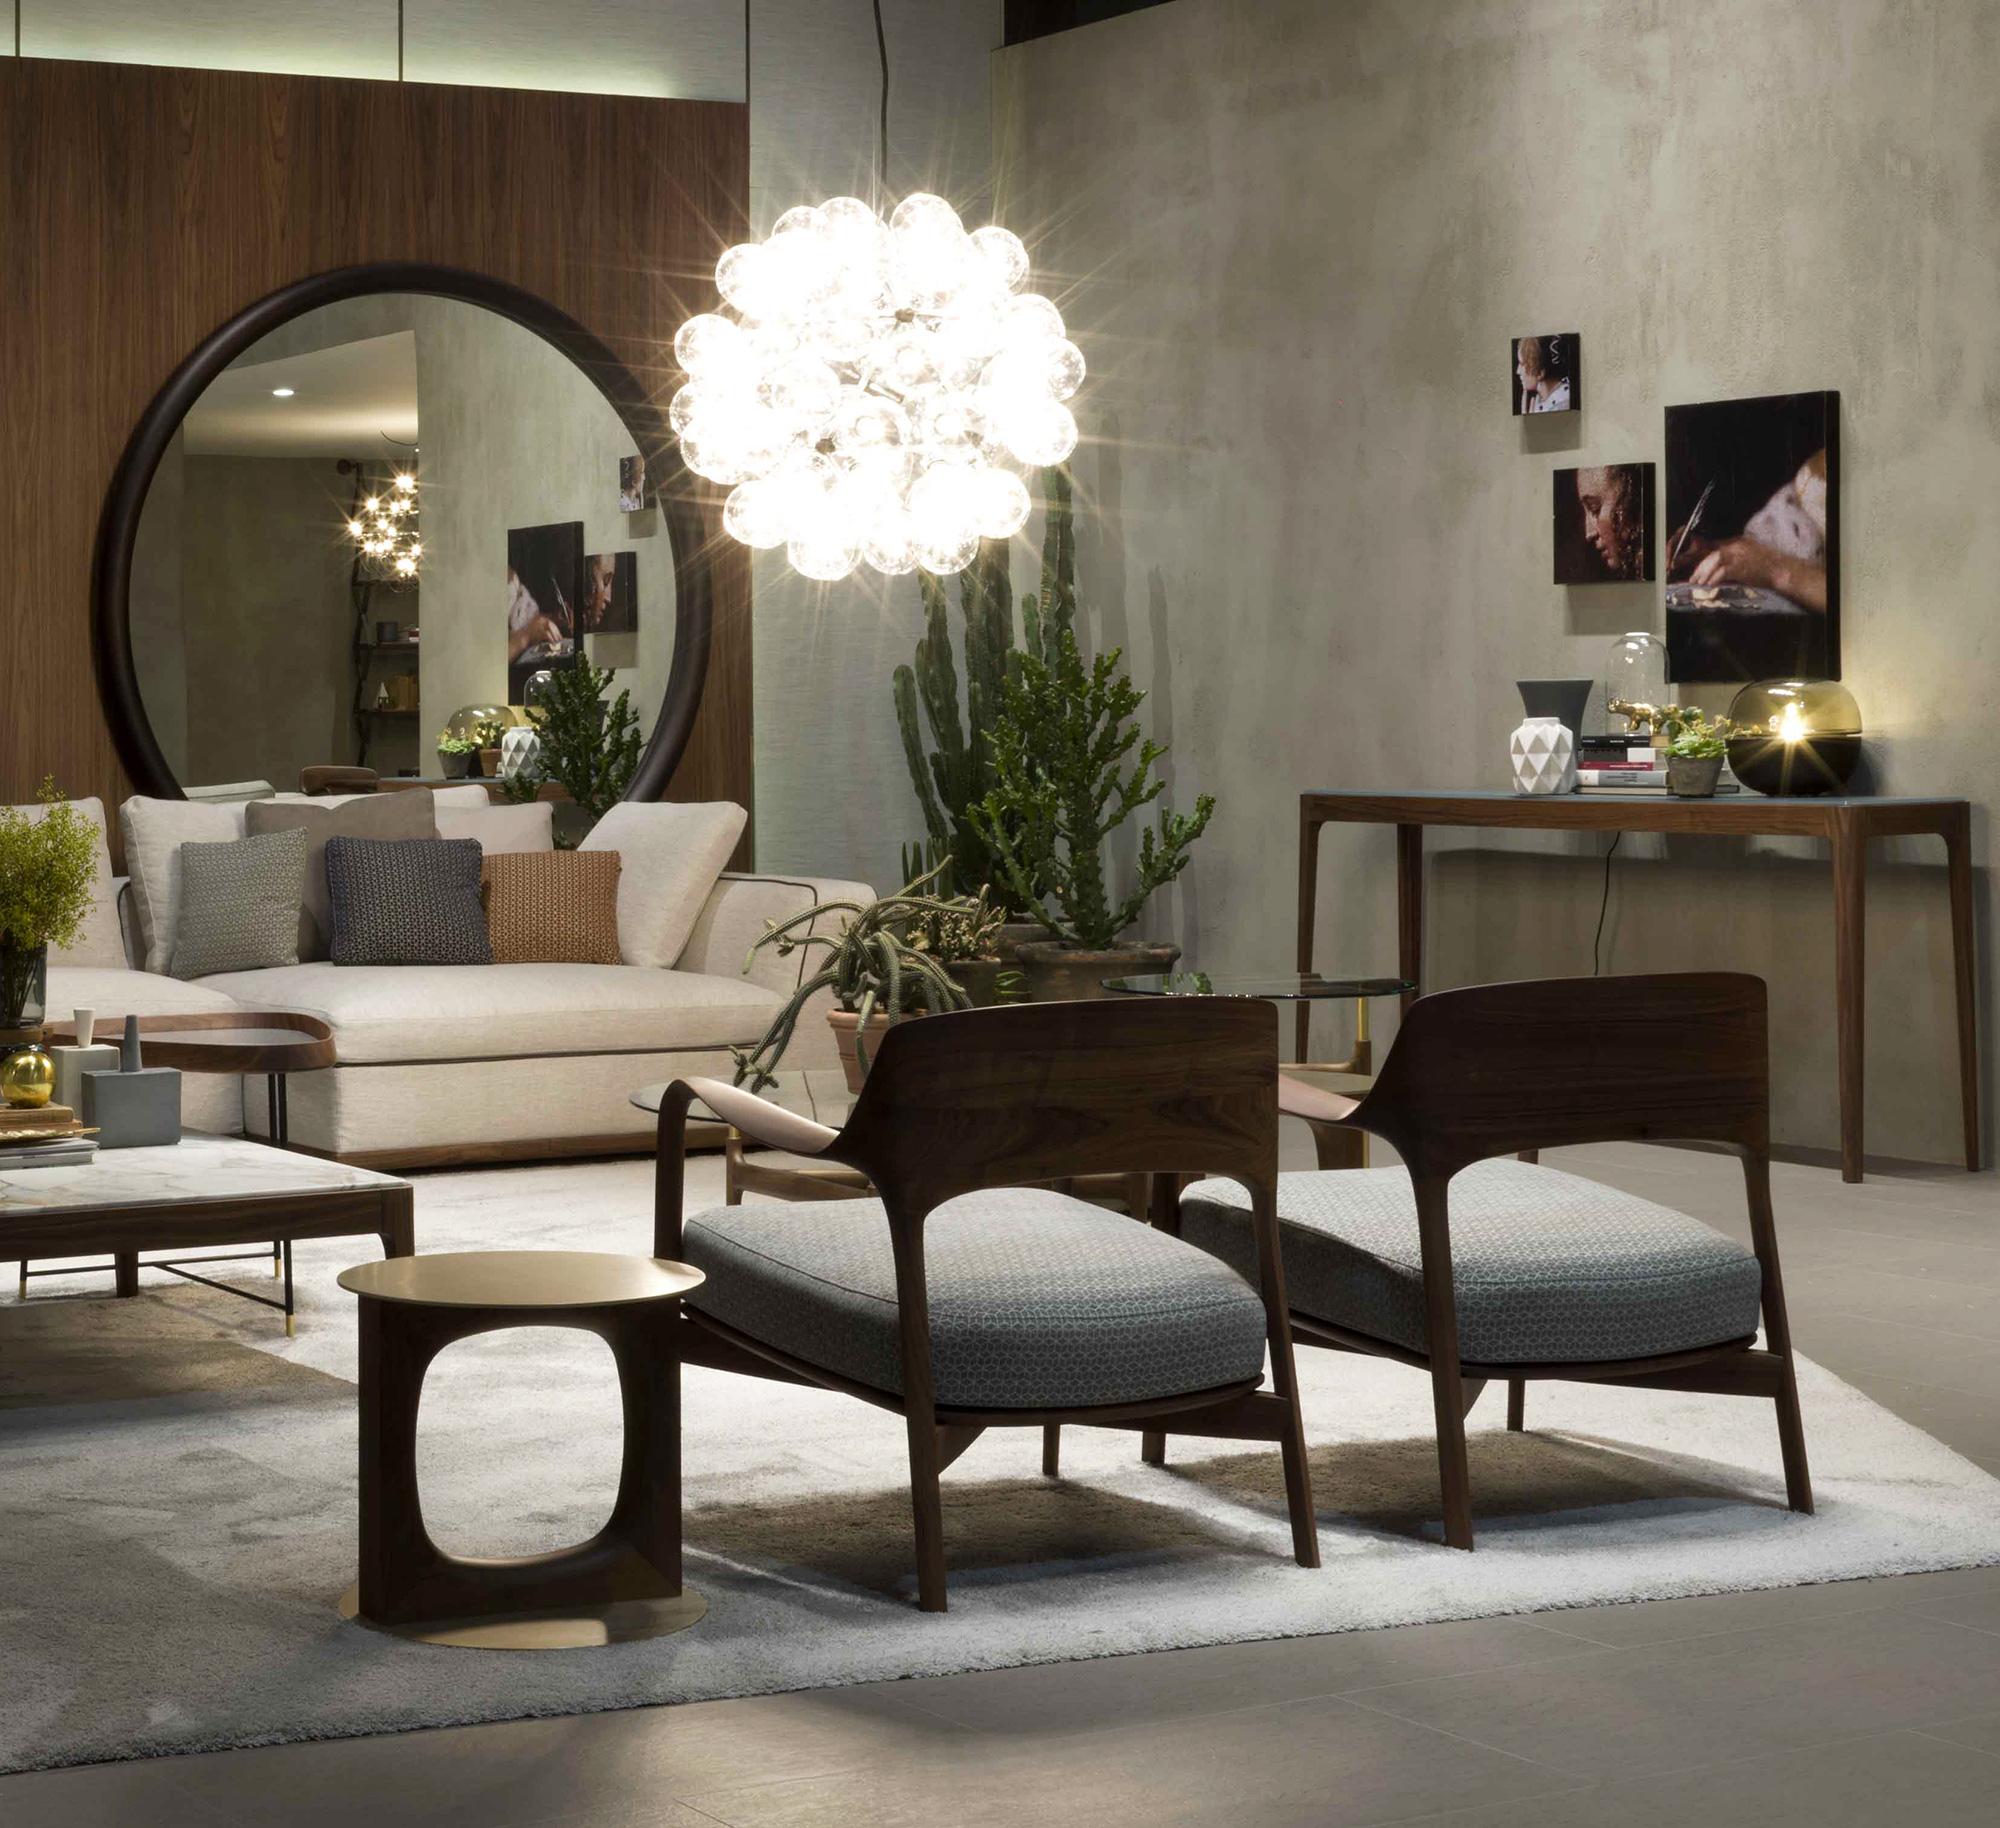 high end italian designer louis lounge chair italian designer